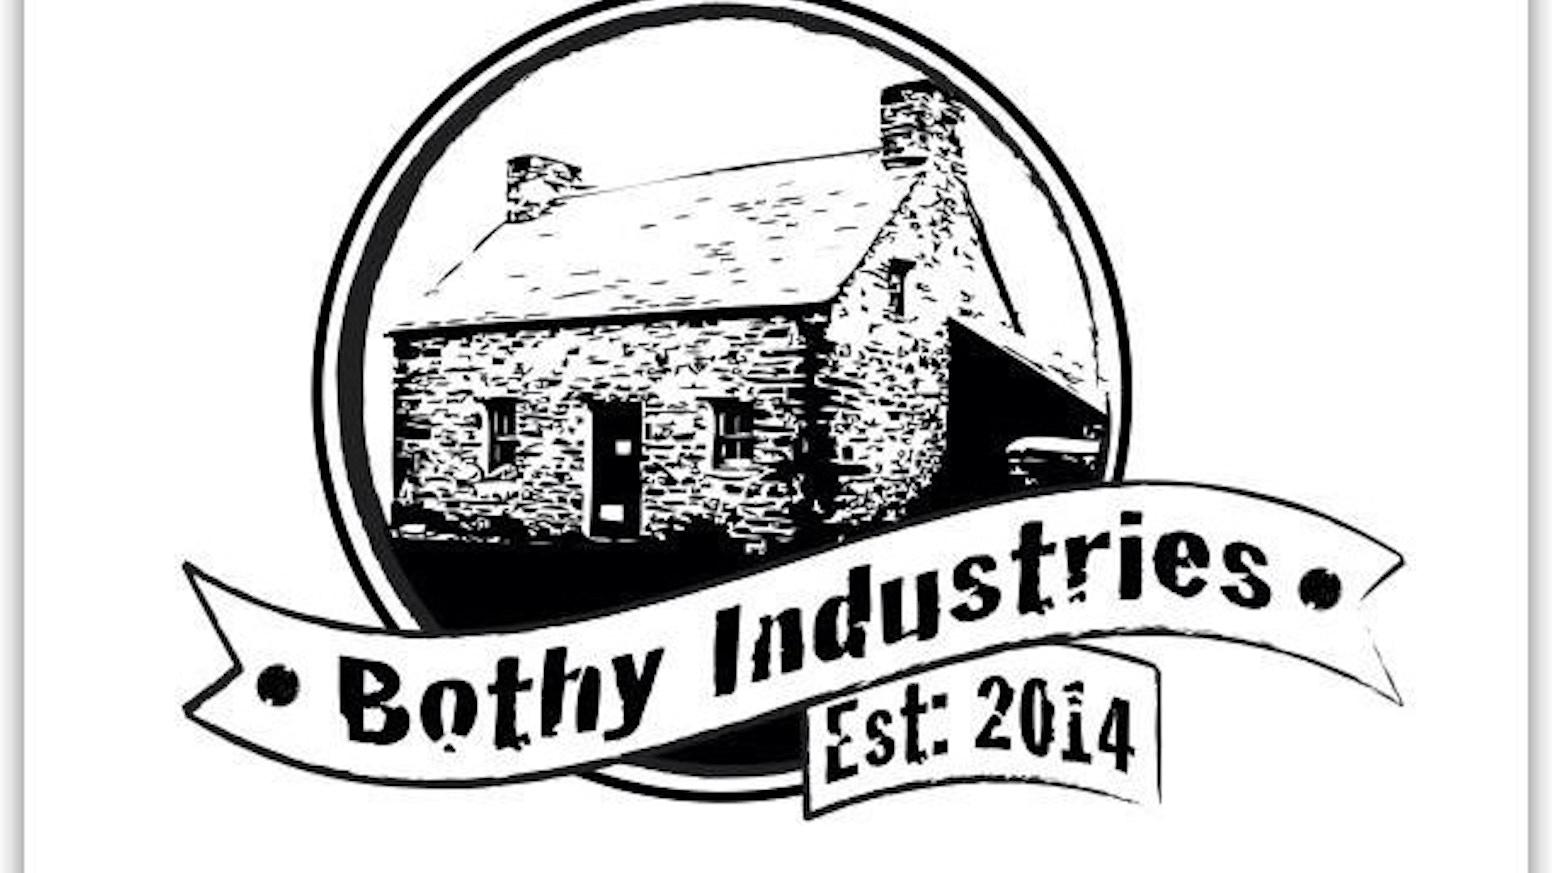 Bothy Industries workshop kickstart by Kevin Riddoch